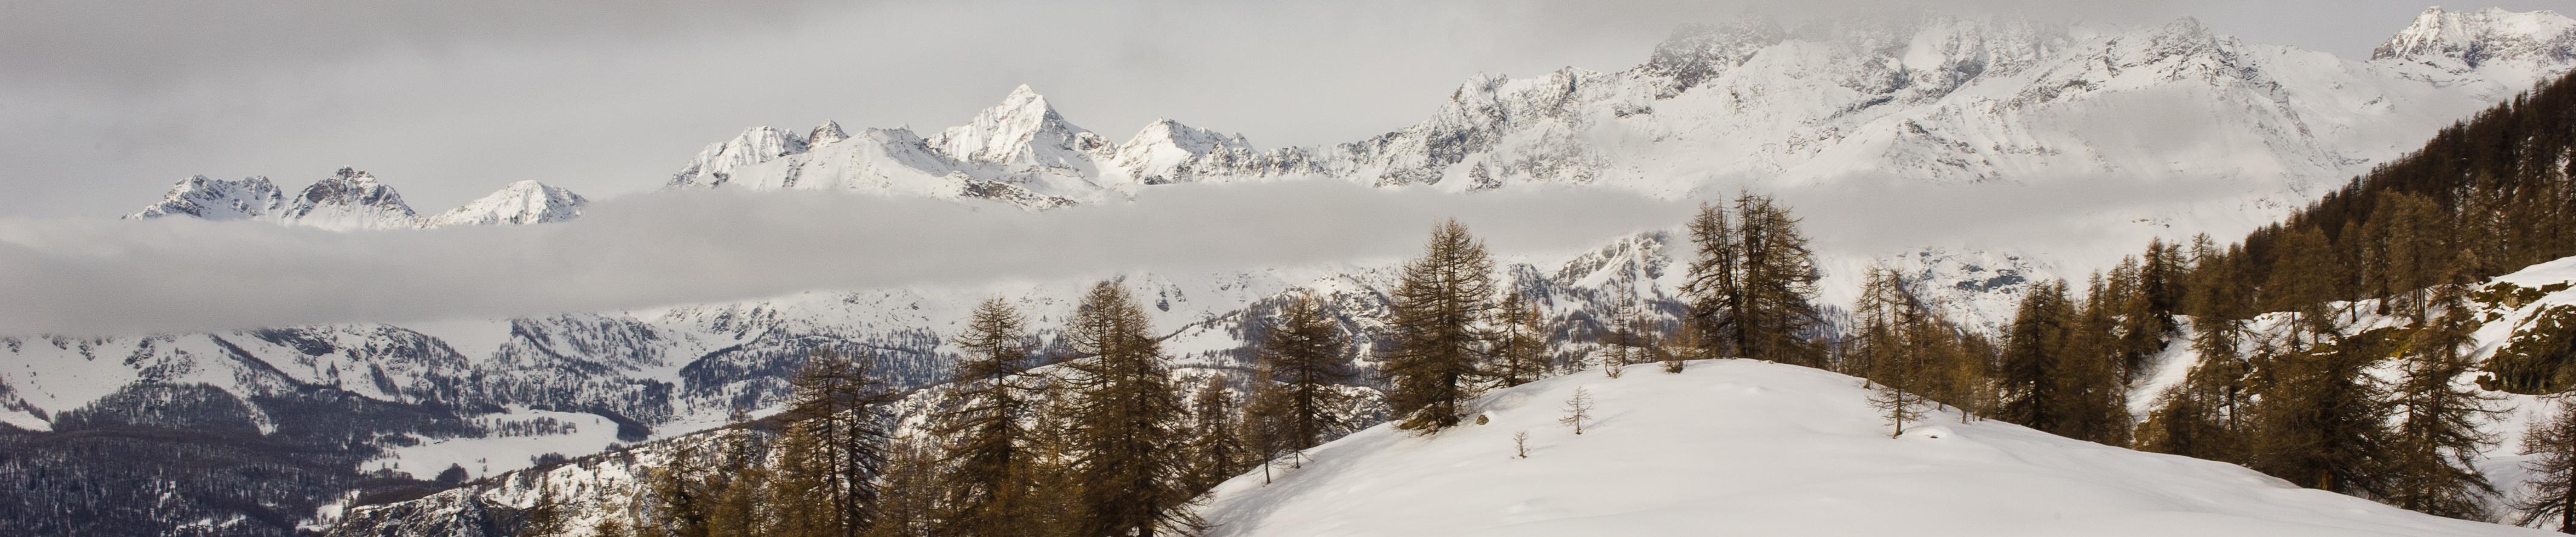 Visuale dall'Alpe Charey damon